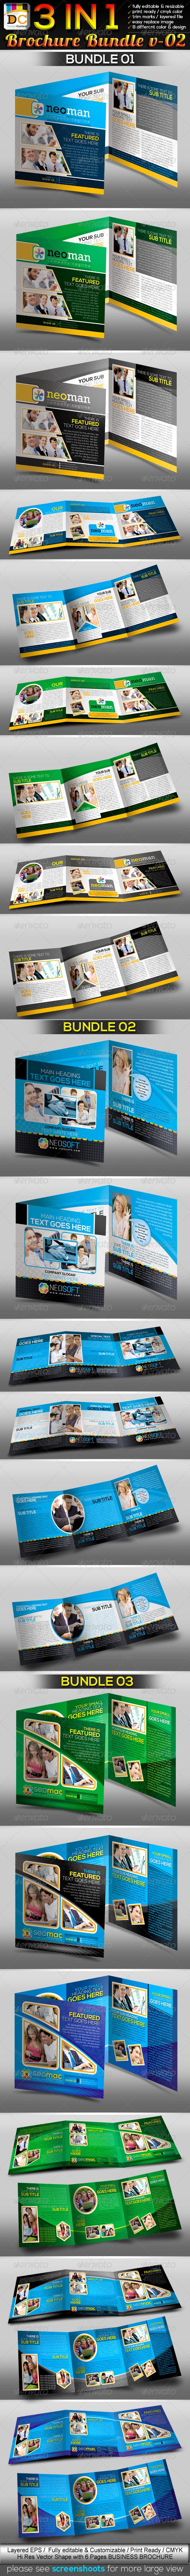 GraphicRiver 3in1 Corporate Tri-fold Business Brochure Bundle 3875513